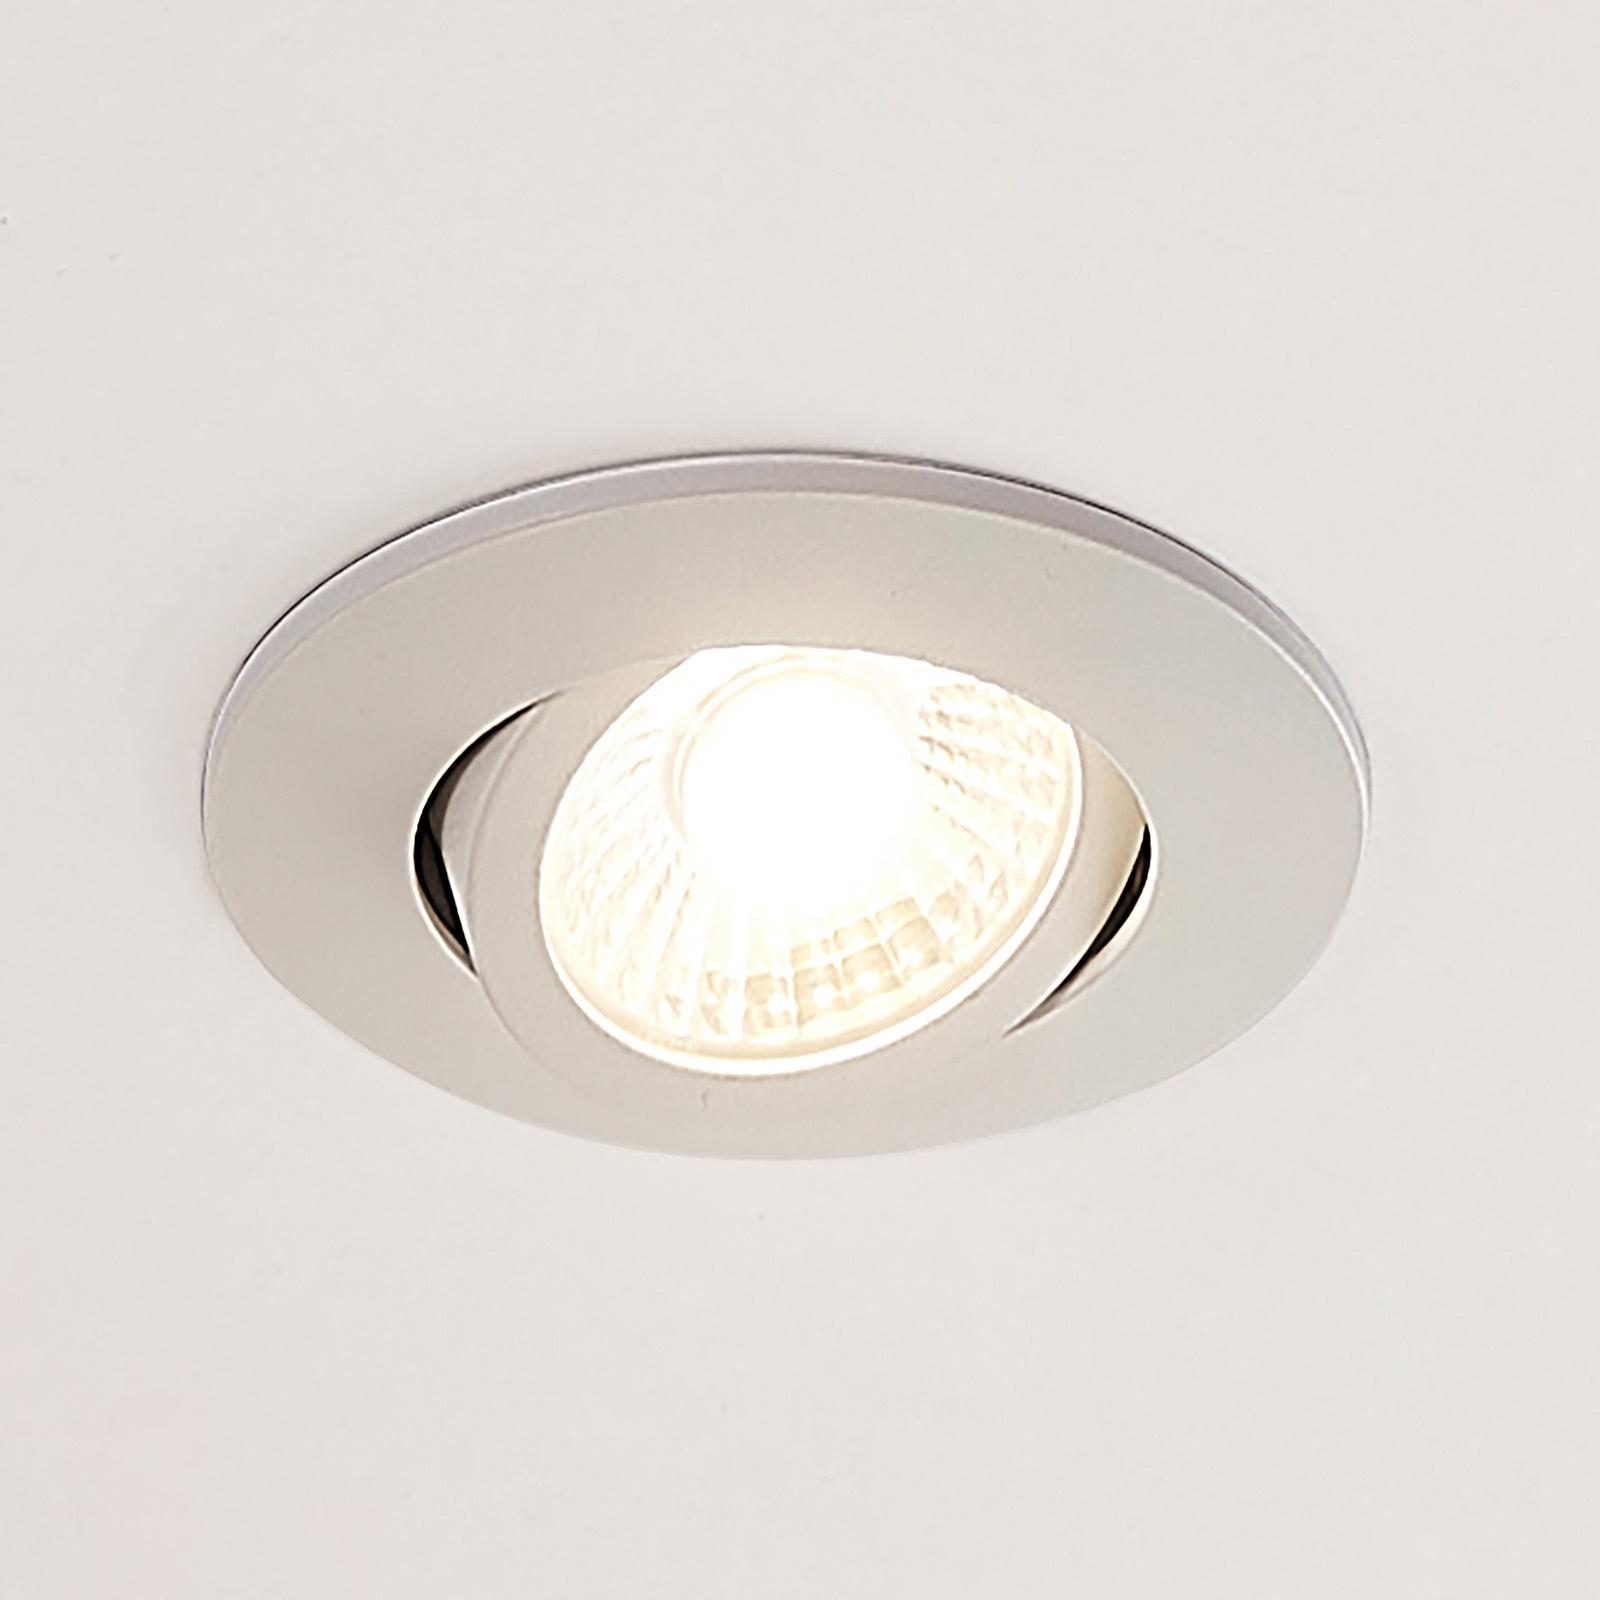 Arcchio Ricals downlight LED, ściemniany